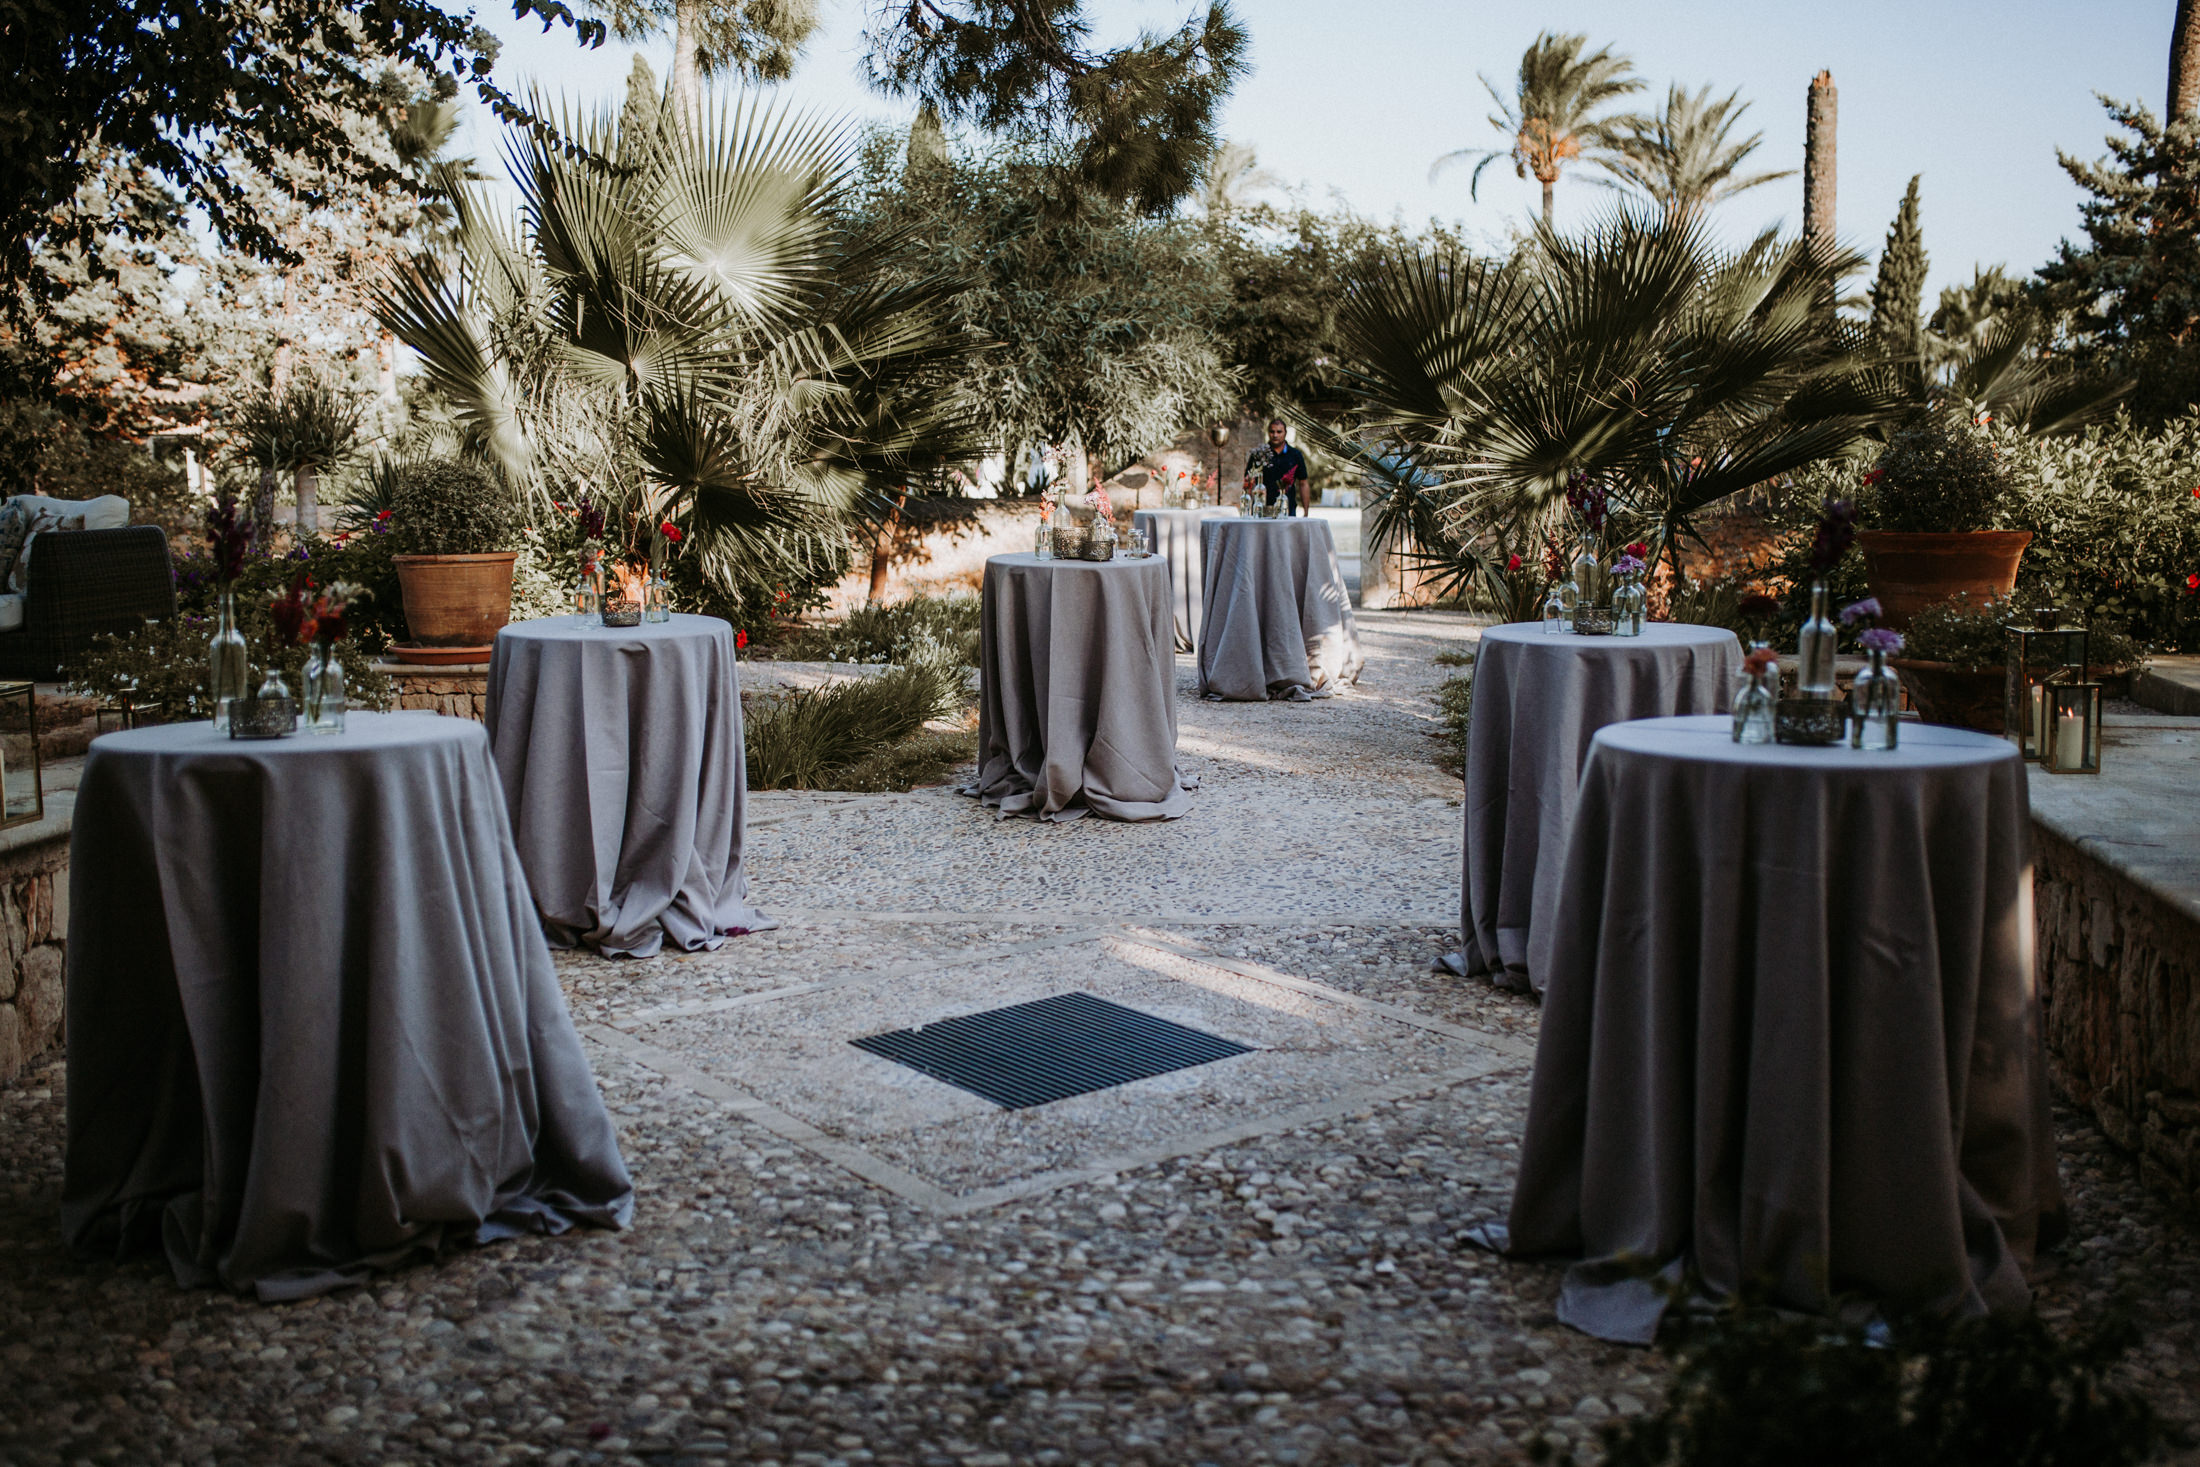 Wedding_Photographer_Mallorca_Daniela-Marquardt_Photography_New_York_Iceland_Tuscany_Santorini_Portugal_Austria_Bavaria_Elopement_Hochzeitsfotograf_AntjeRajat1_37